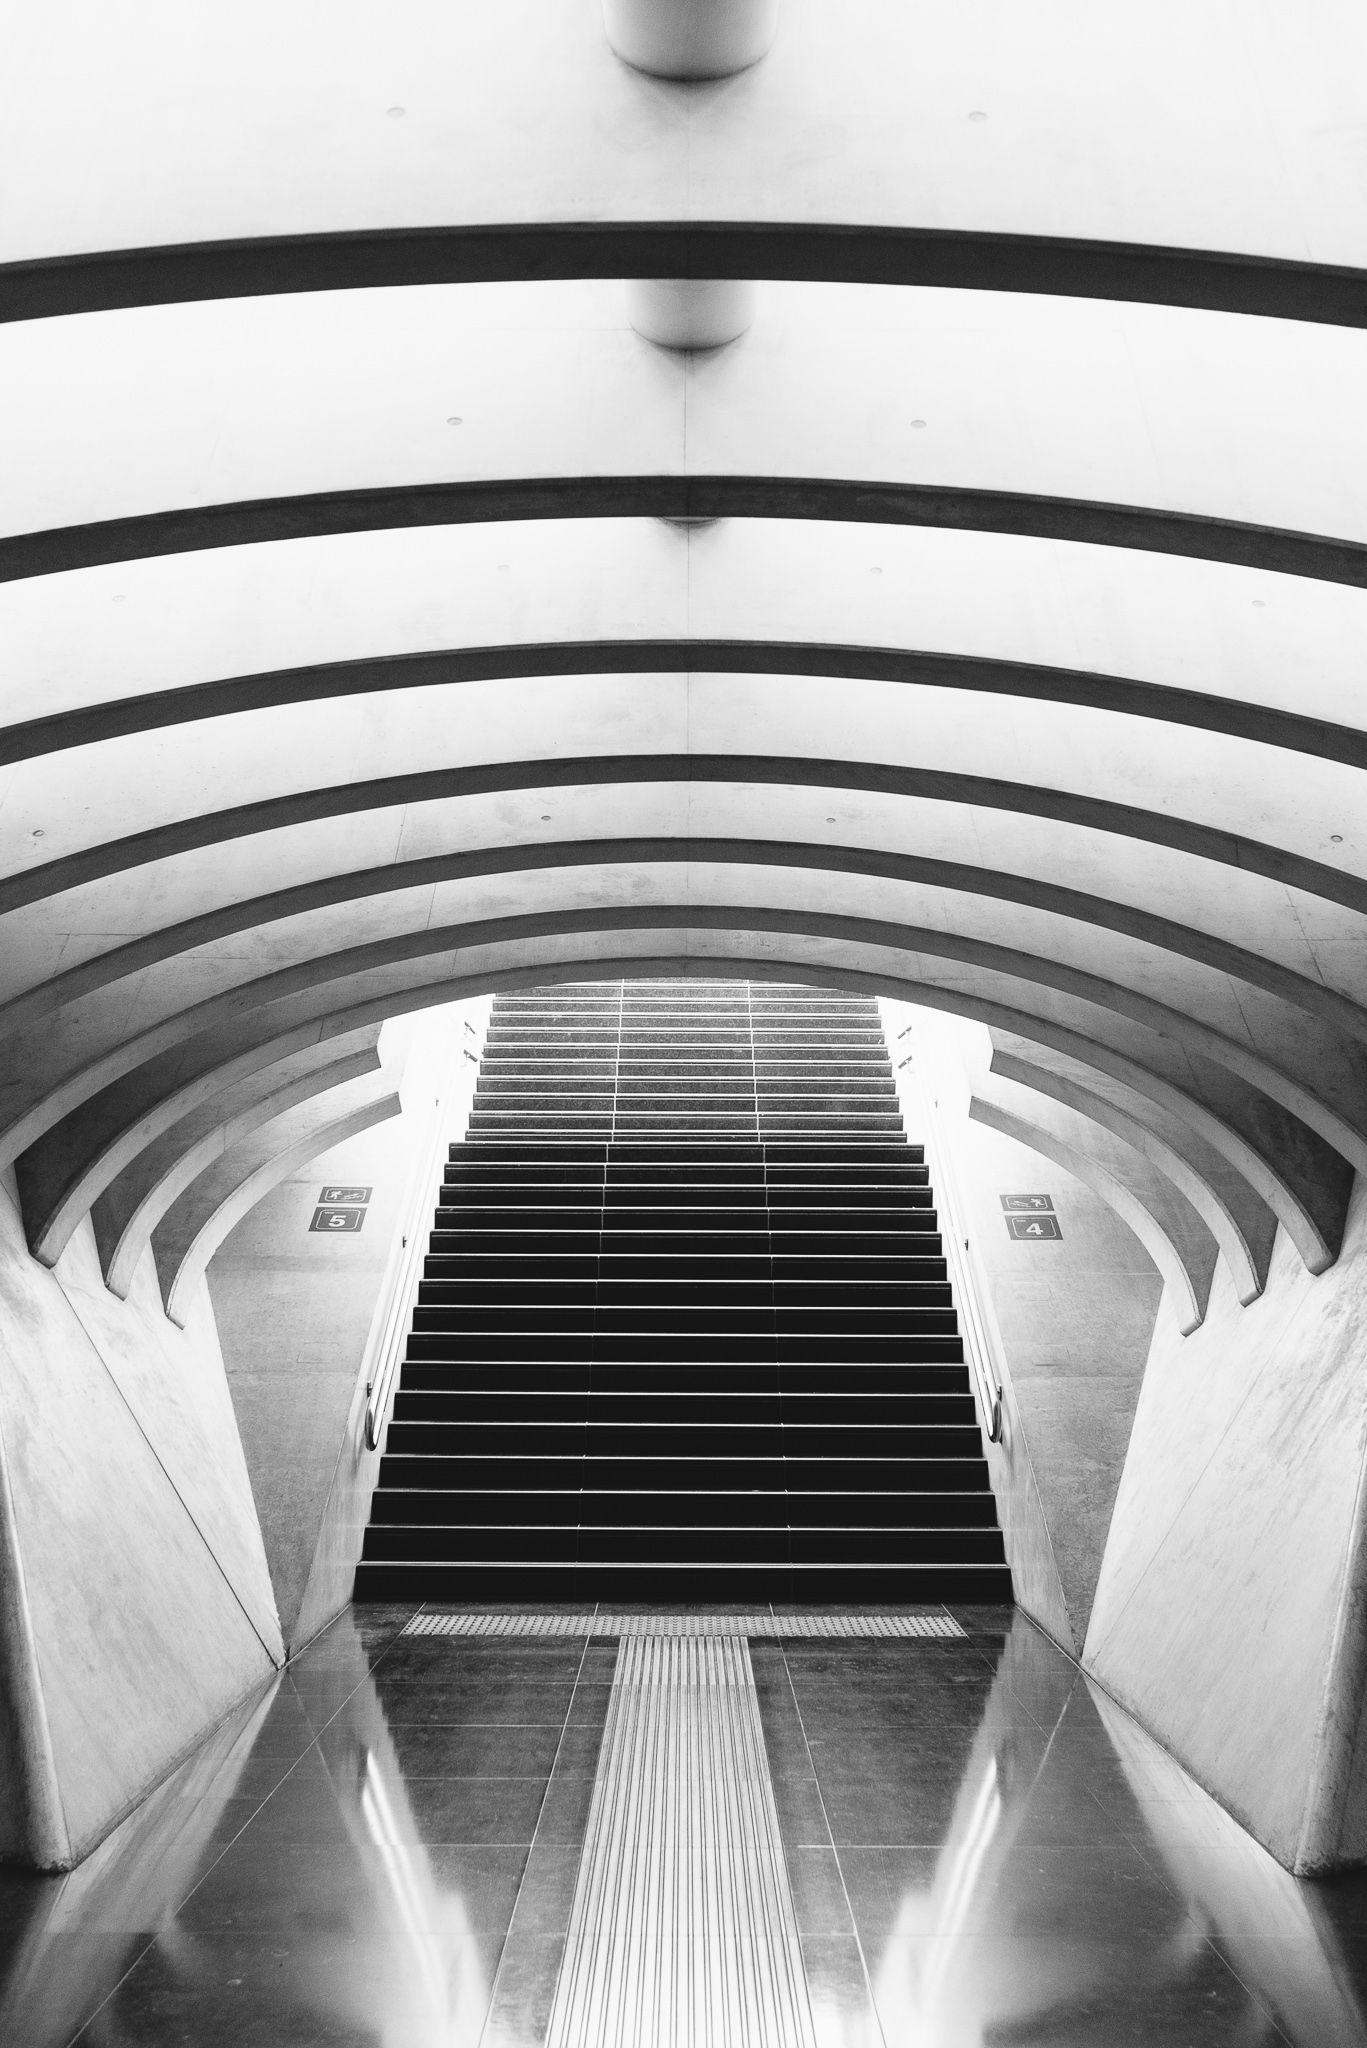 belgium_liege_luik_train_station_28mm_elmarit_asph